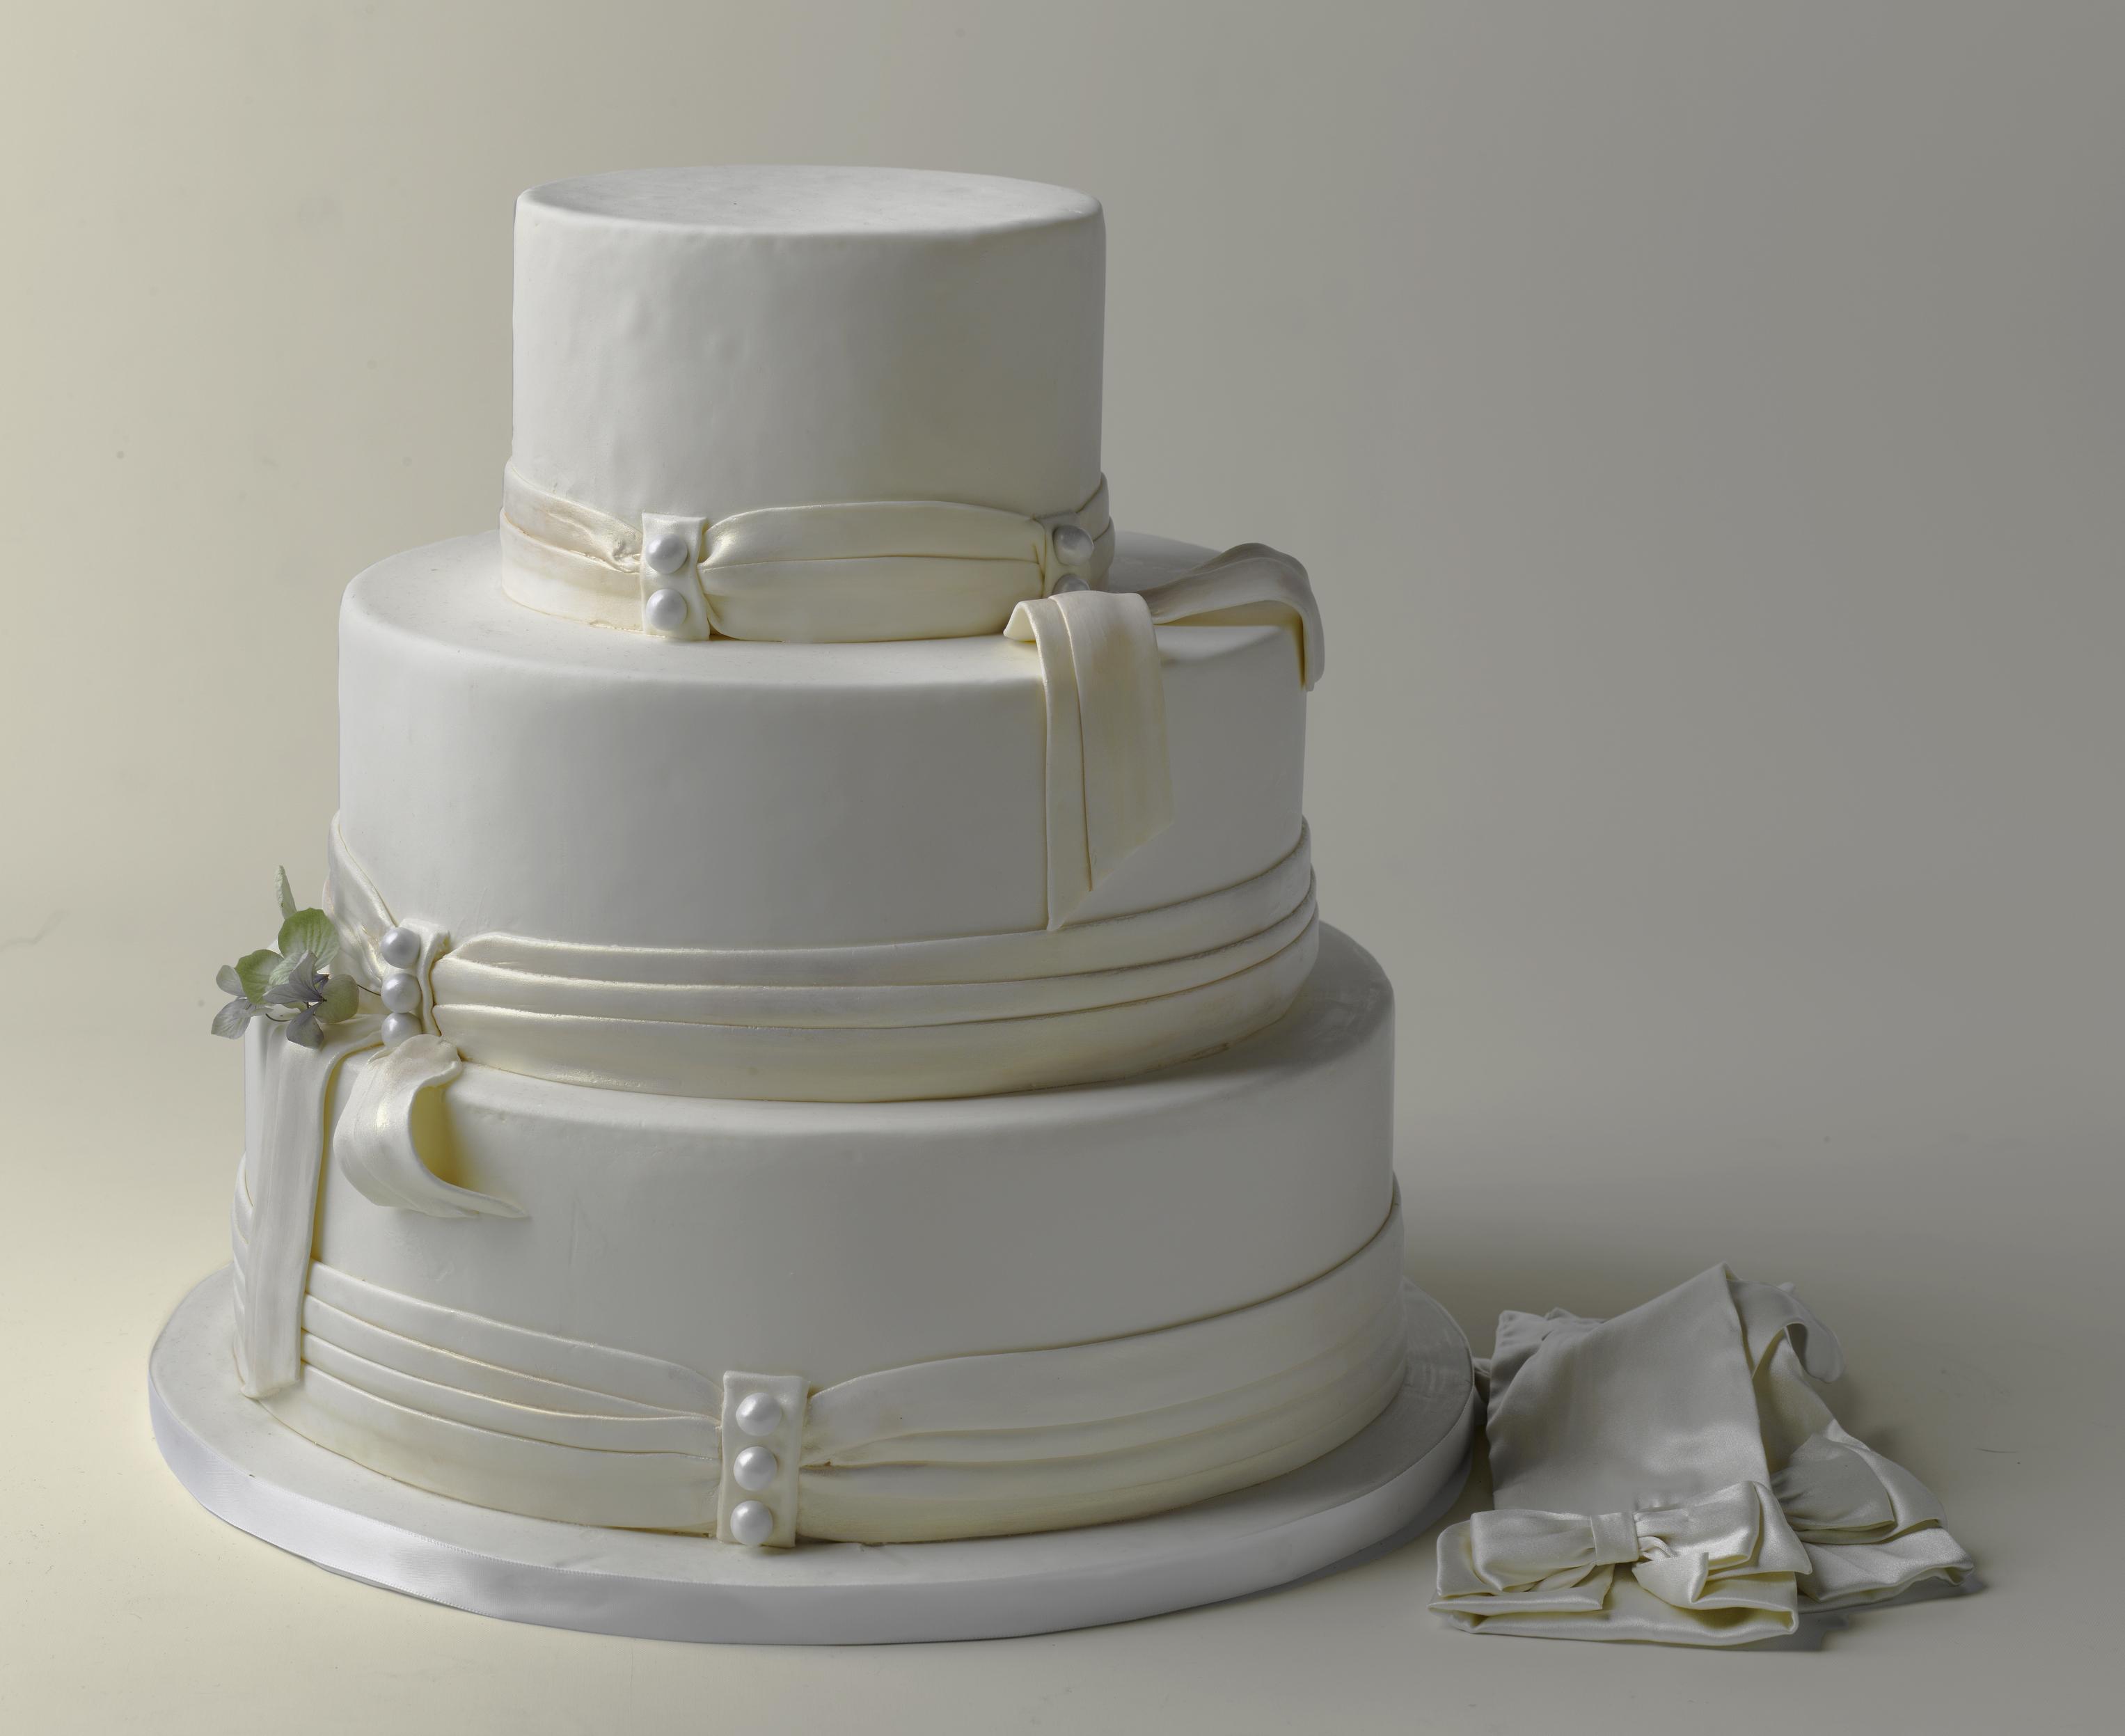 Cake1_00005-edit